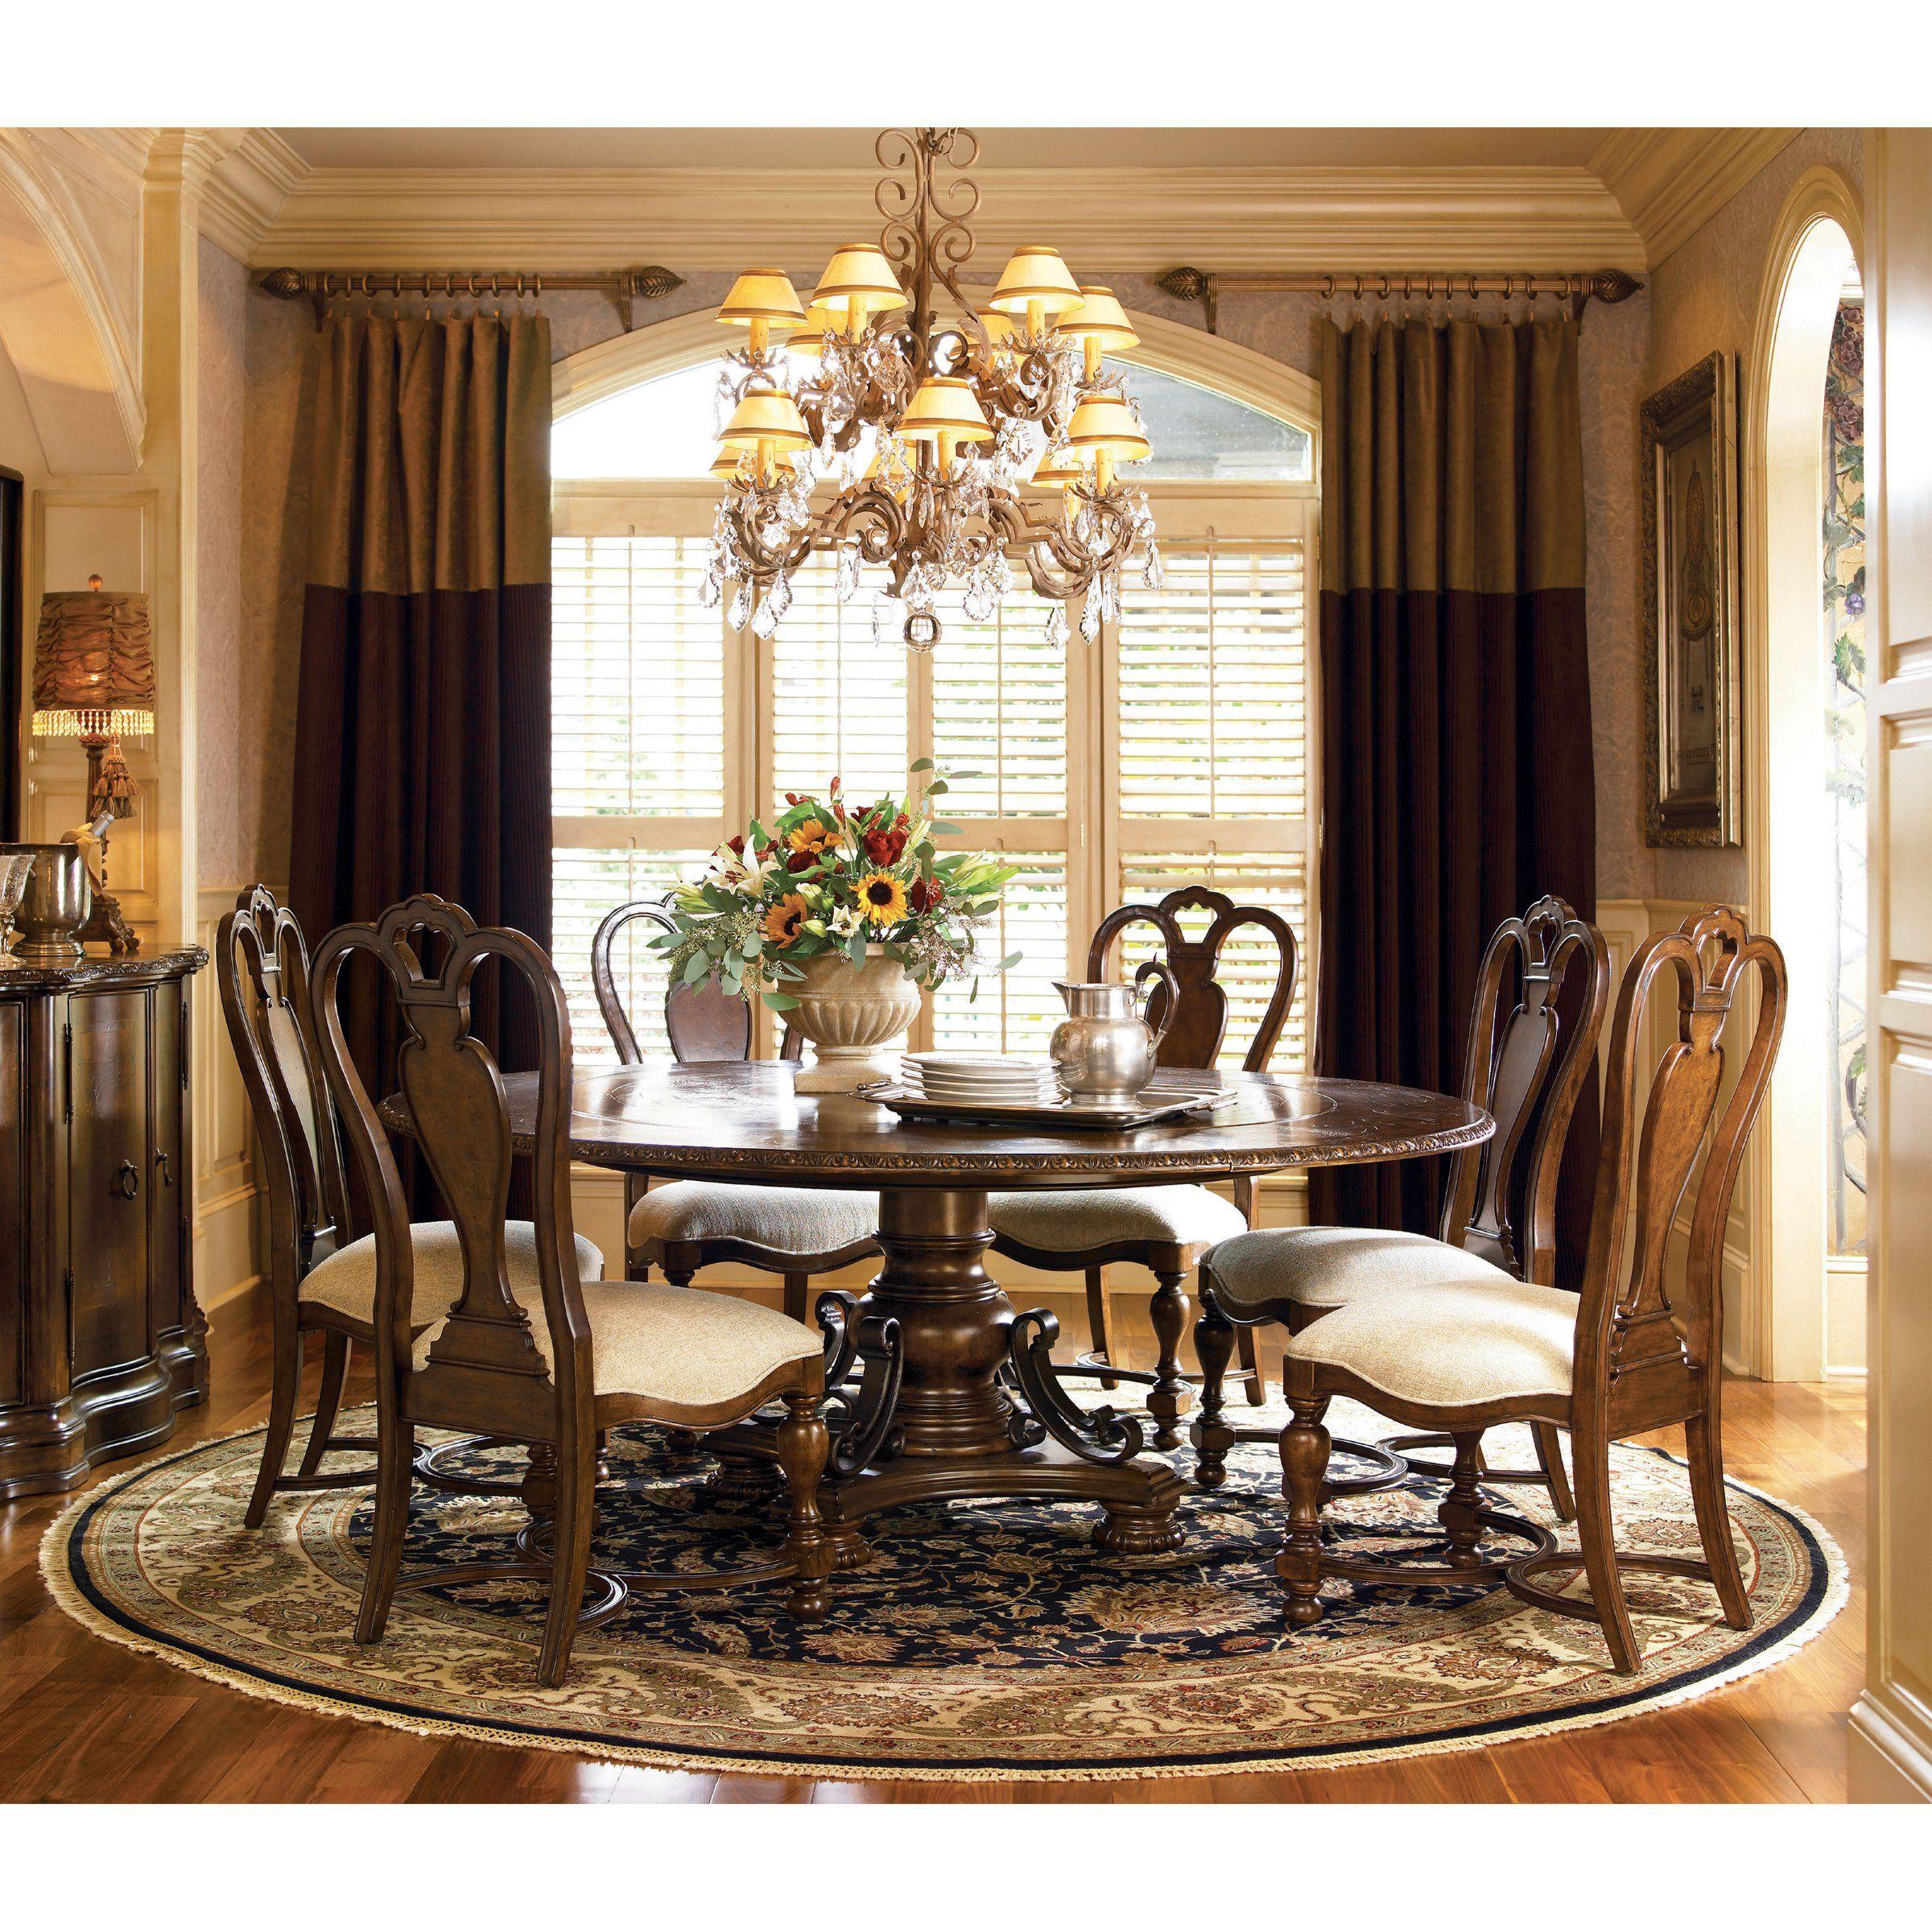 High Quality Universal Furniture Bolero Seville 7 Piece Dining Set   Kitchen U0026 Dining  Table Sets At Hayneedle